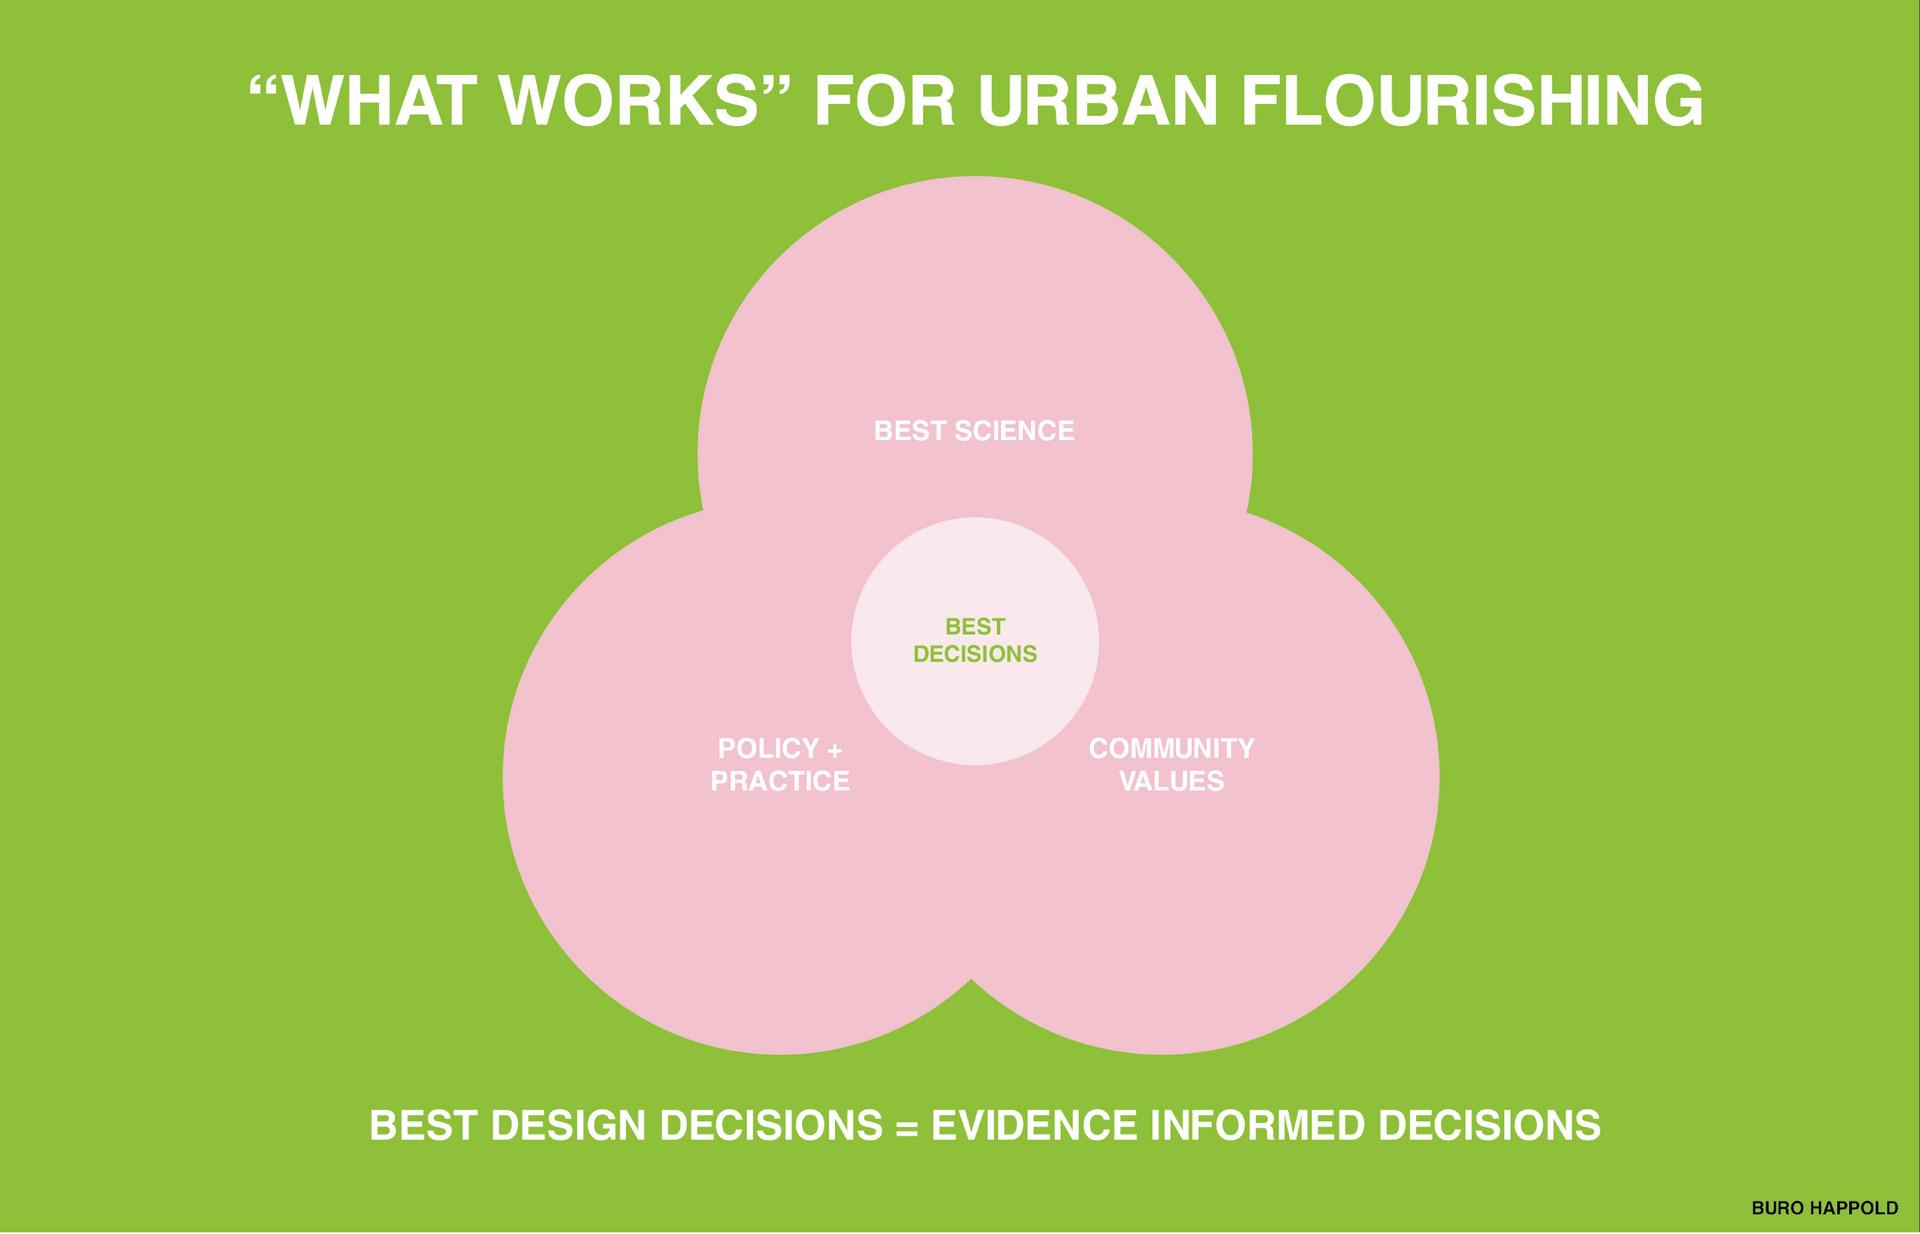 DESIGN DECISIONS FOR URBAN FLOURISHING